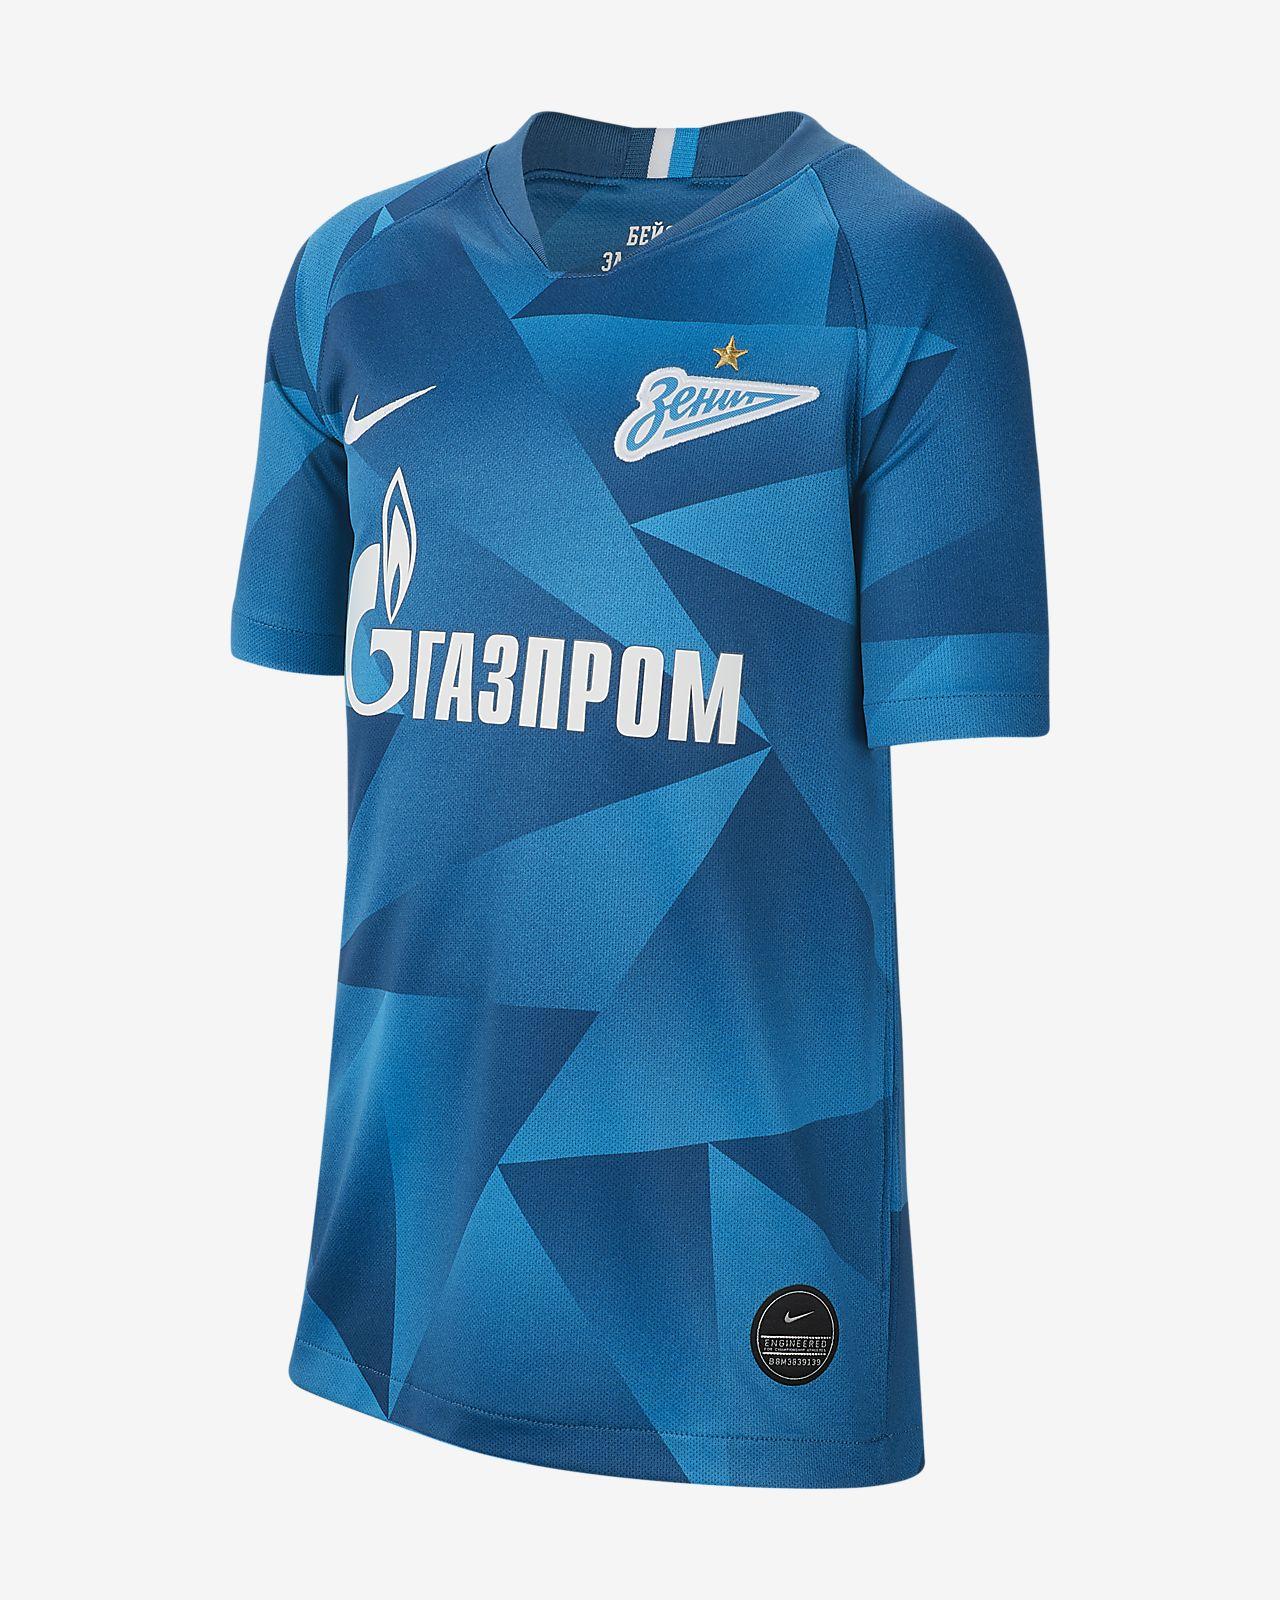 Zenit Saint Petersburg 2019/20 Stadium Home Camiseta de fútbol - Niño/a